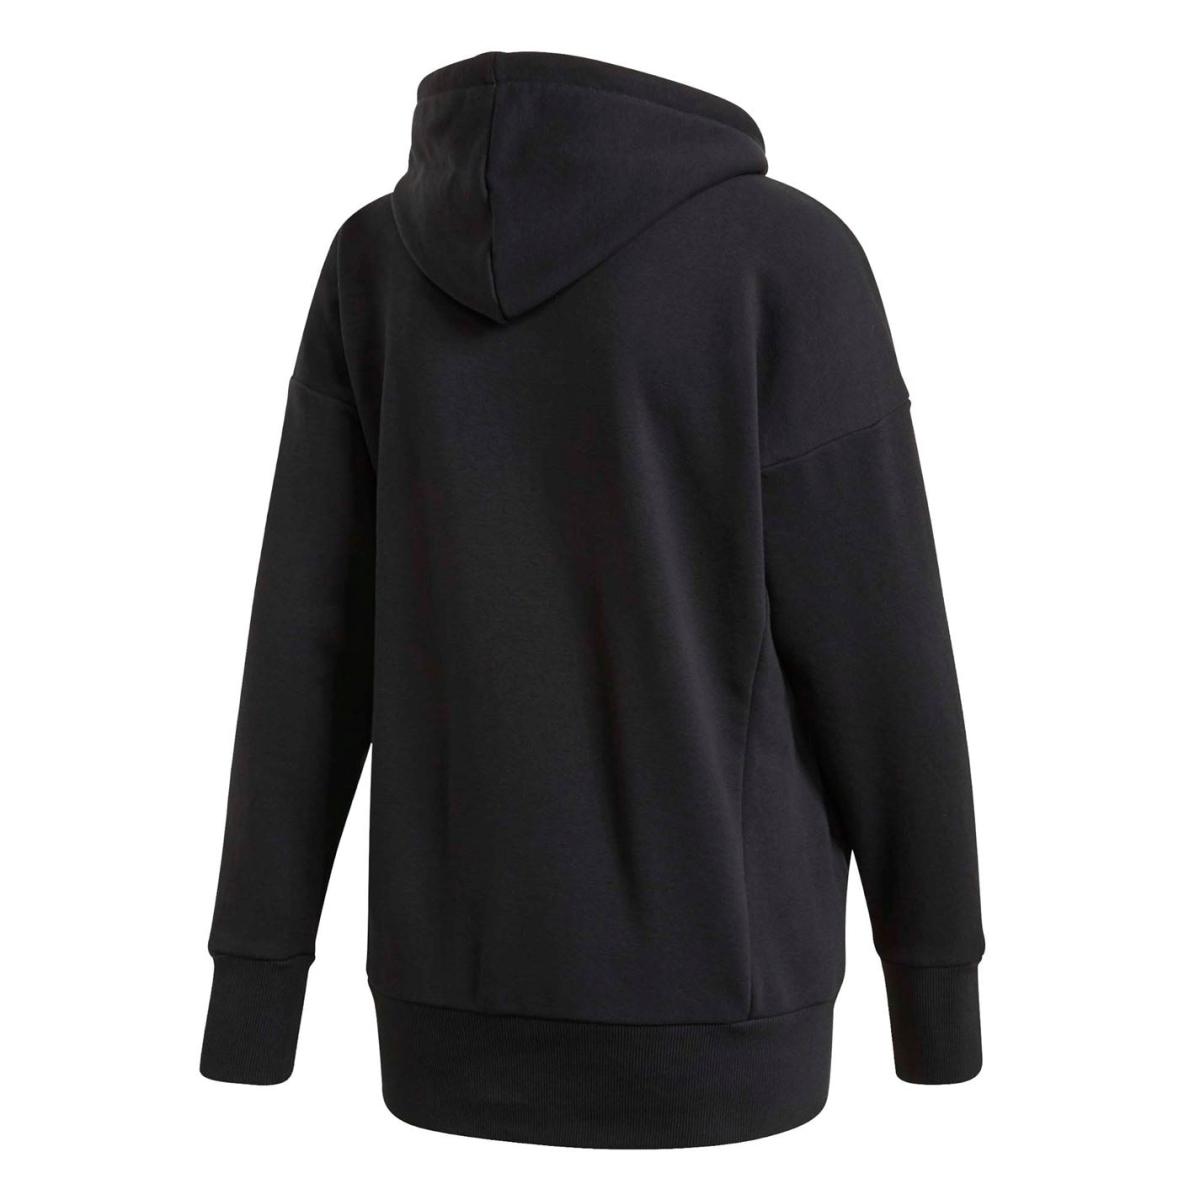 adidas BOS Kapuzenpullover Sweatshirt Pullover Damen Kapuzenjacke Hoodie OTH 029